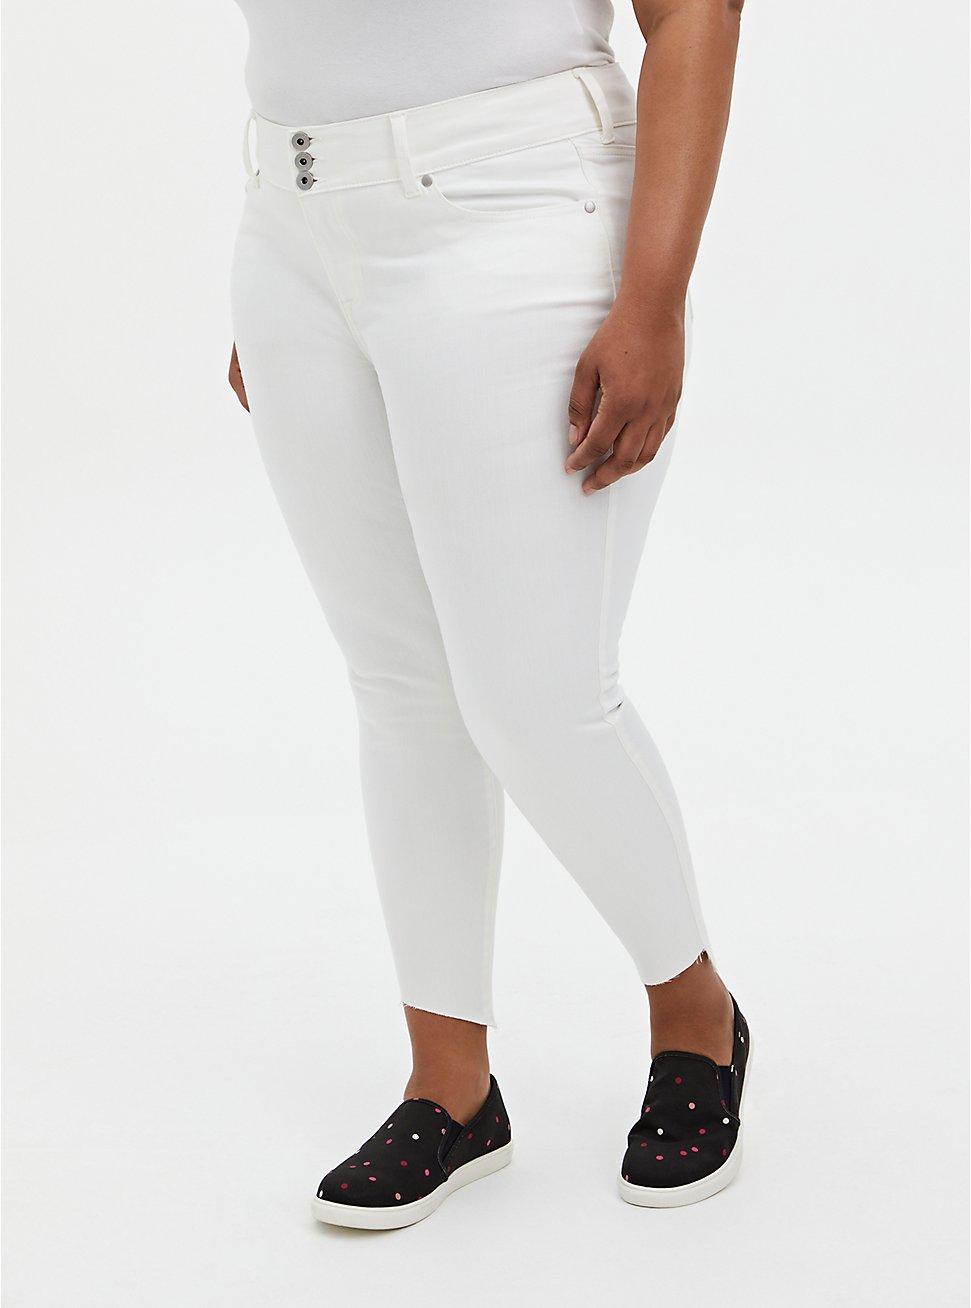 Plus Size Jegging - Super Soft White With Step Hem, WINTER WHITE, hi-res